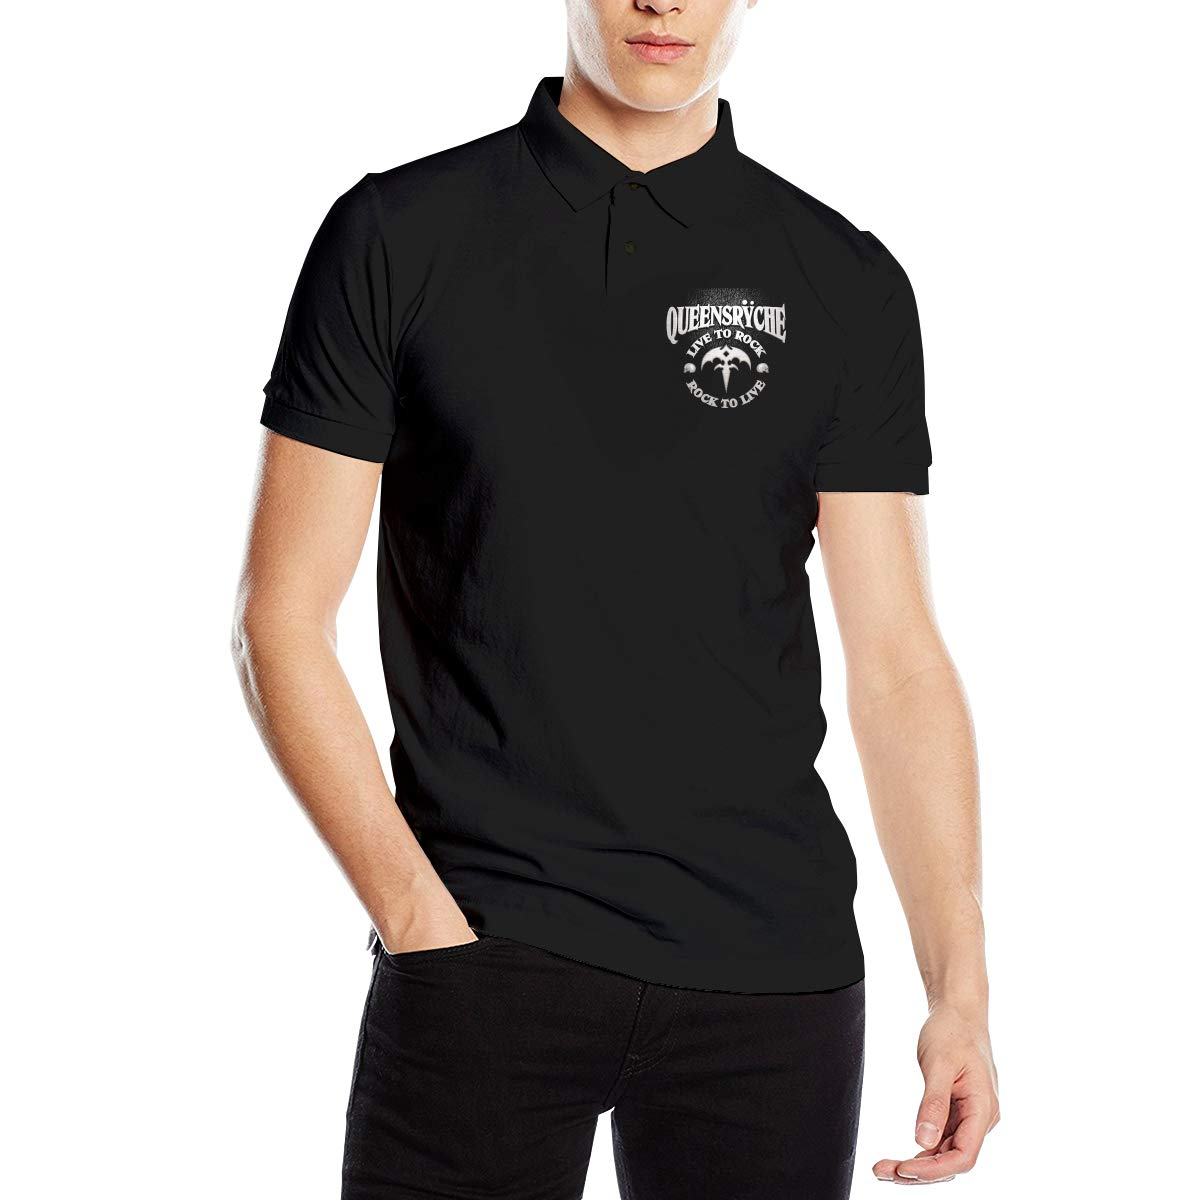 Cjlrqone Queensryche Mens Fashion Polo Shirts XXL Black